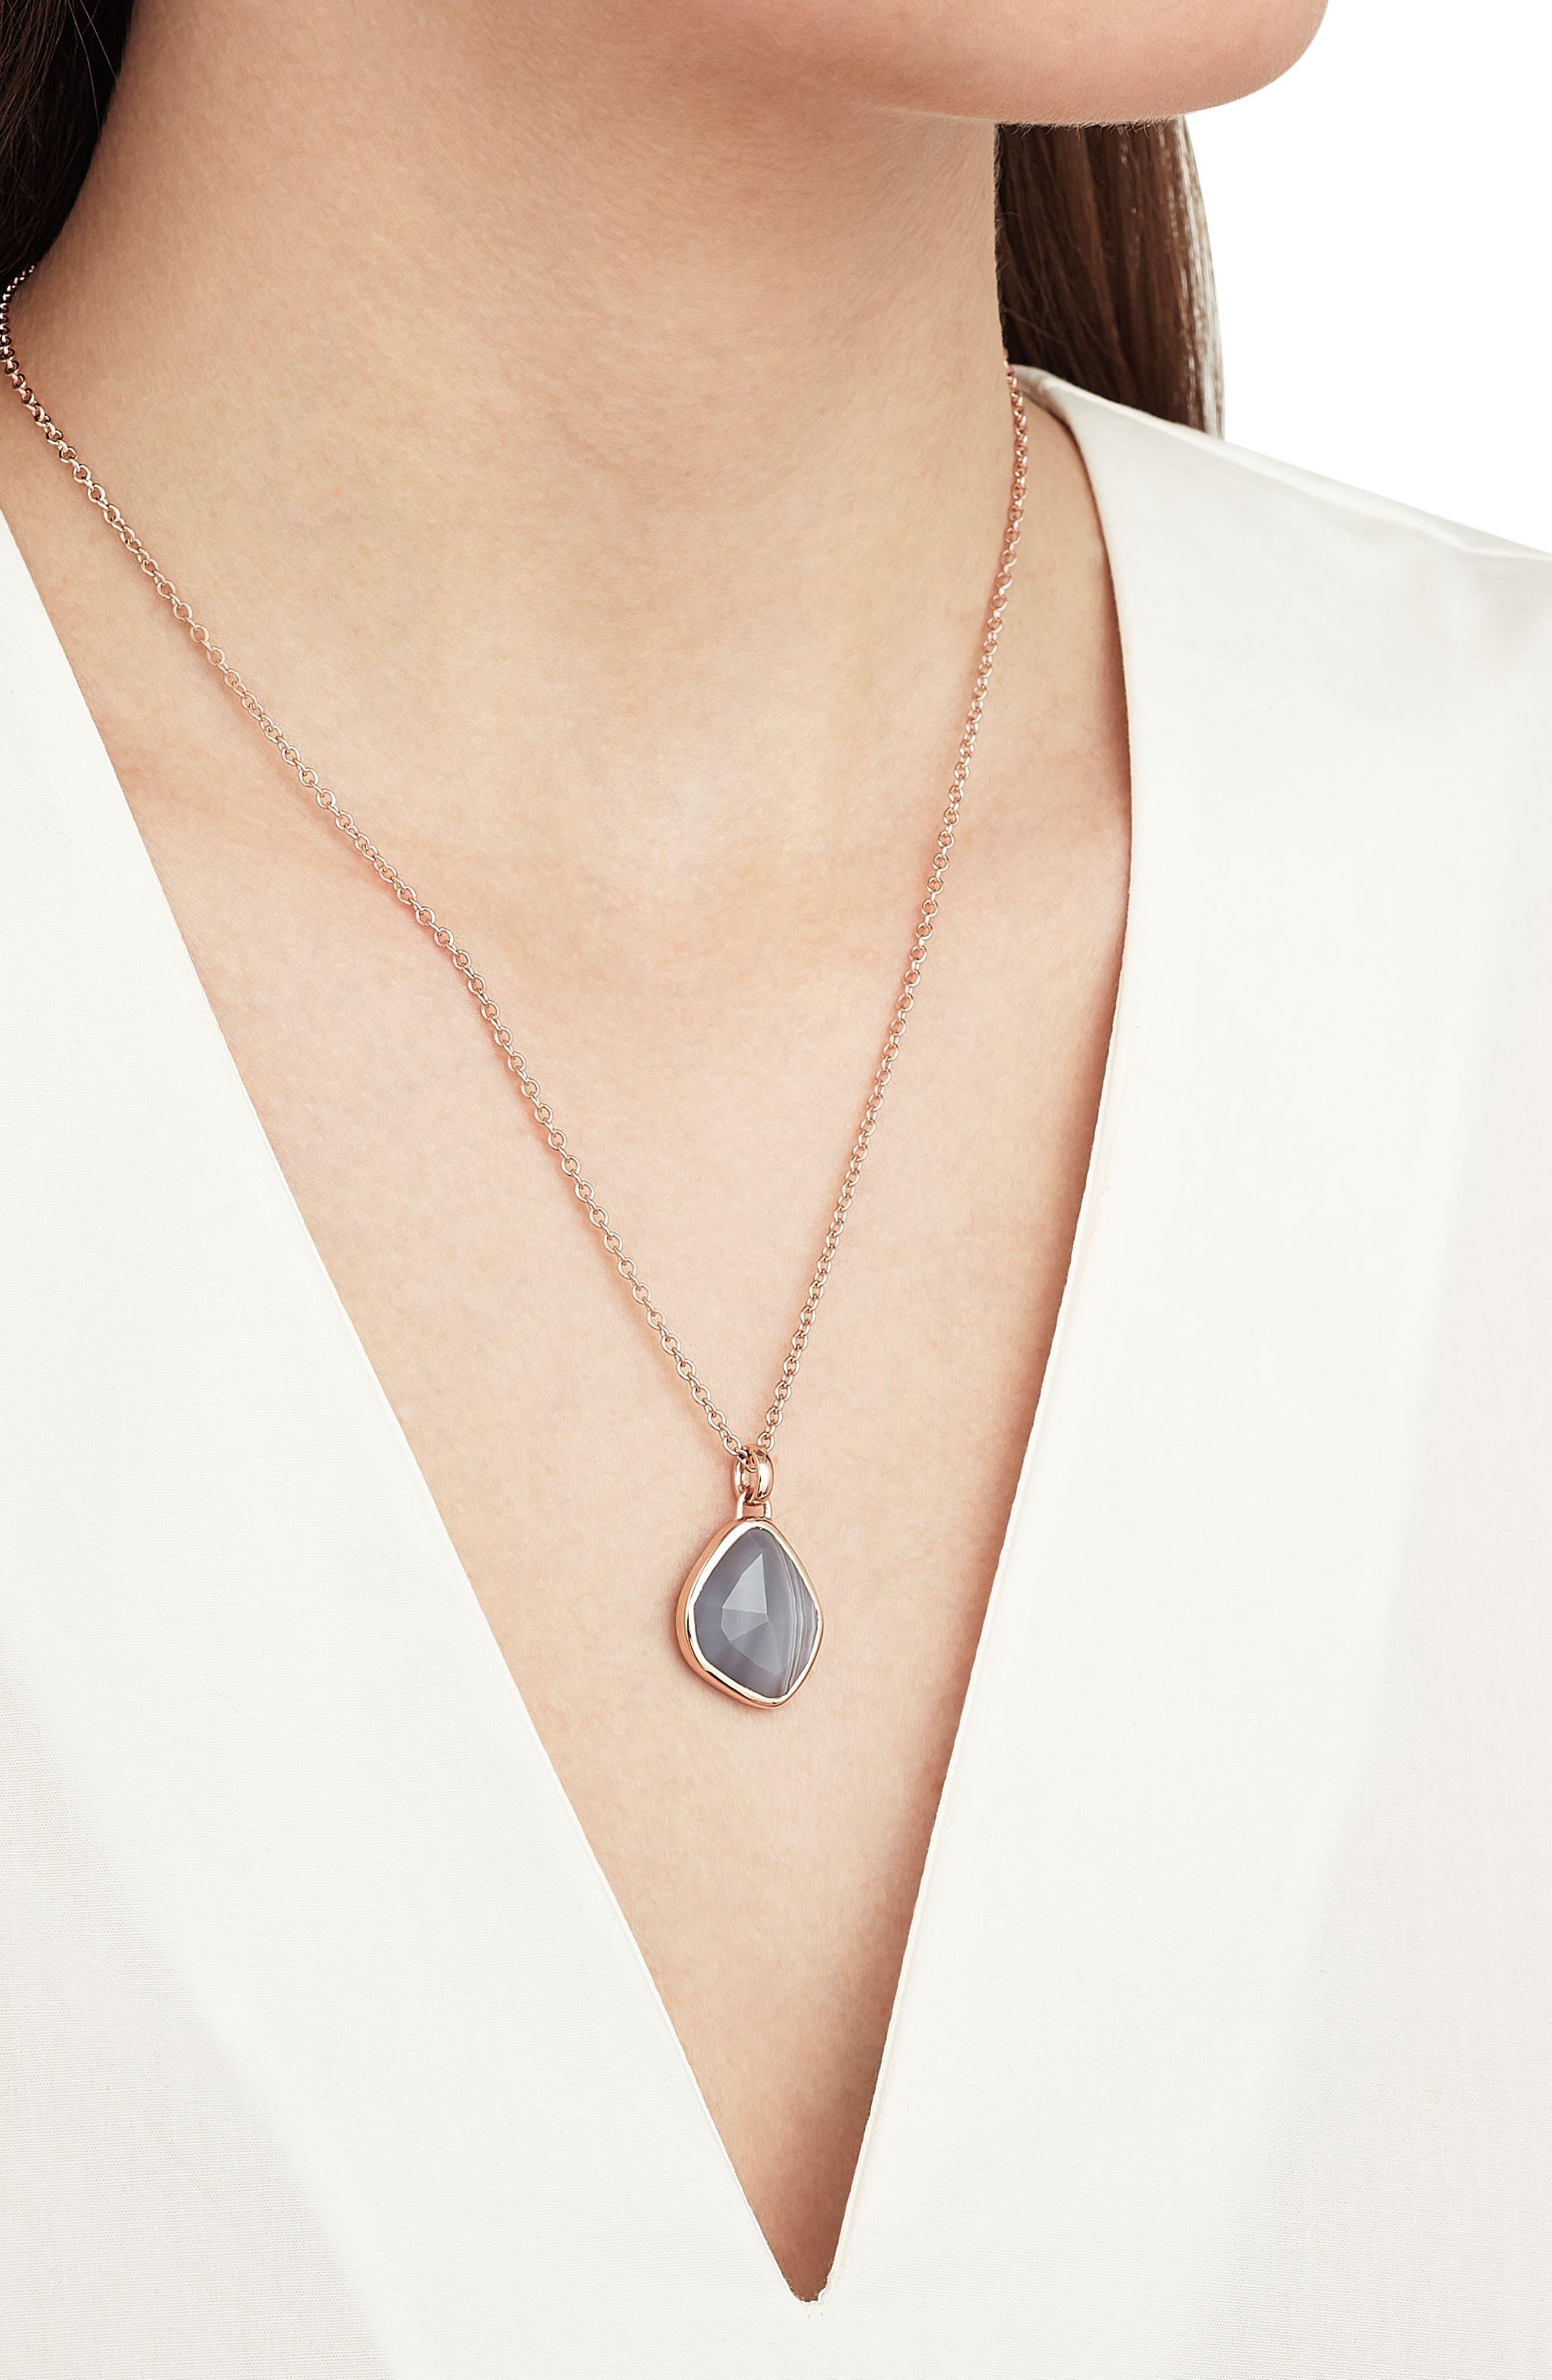 Siren Nugget Semiprecious Stone Pendant,                             Alternate thumbnail 2, color,                             Grey Agate/ Rose Gold